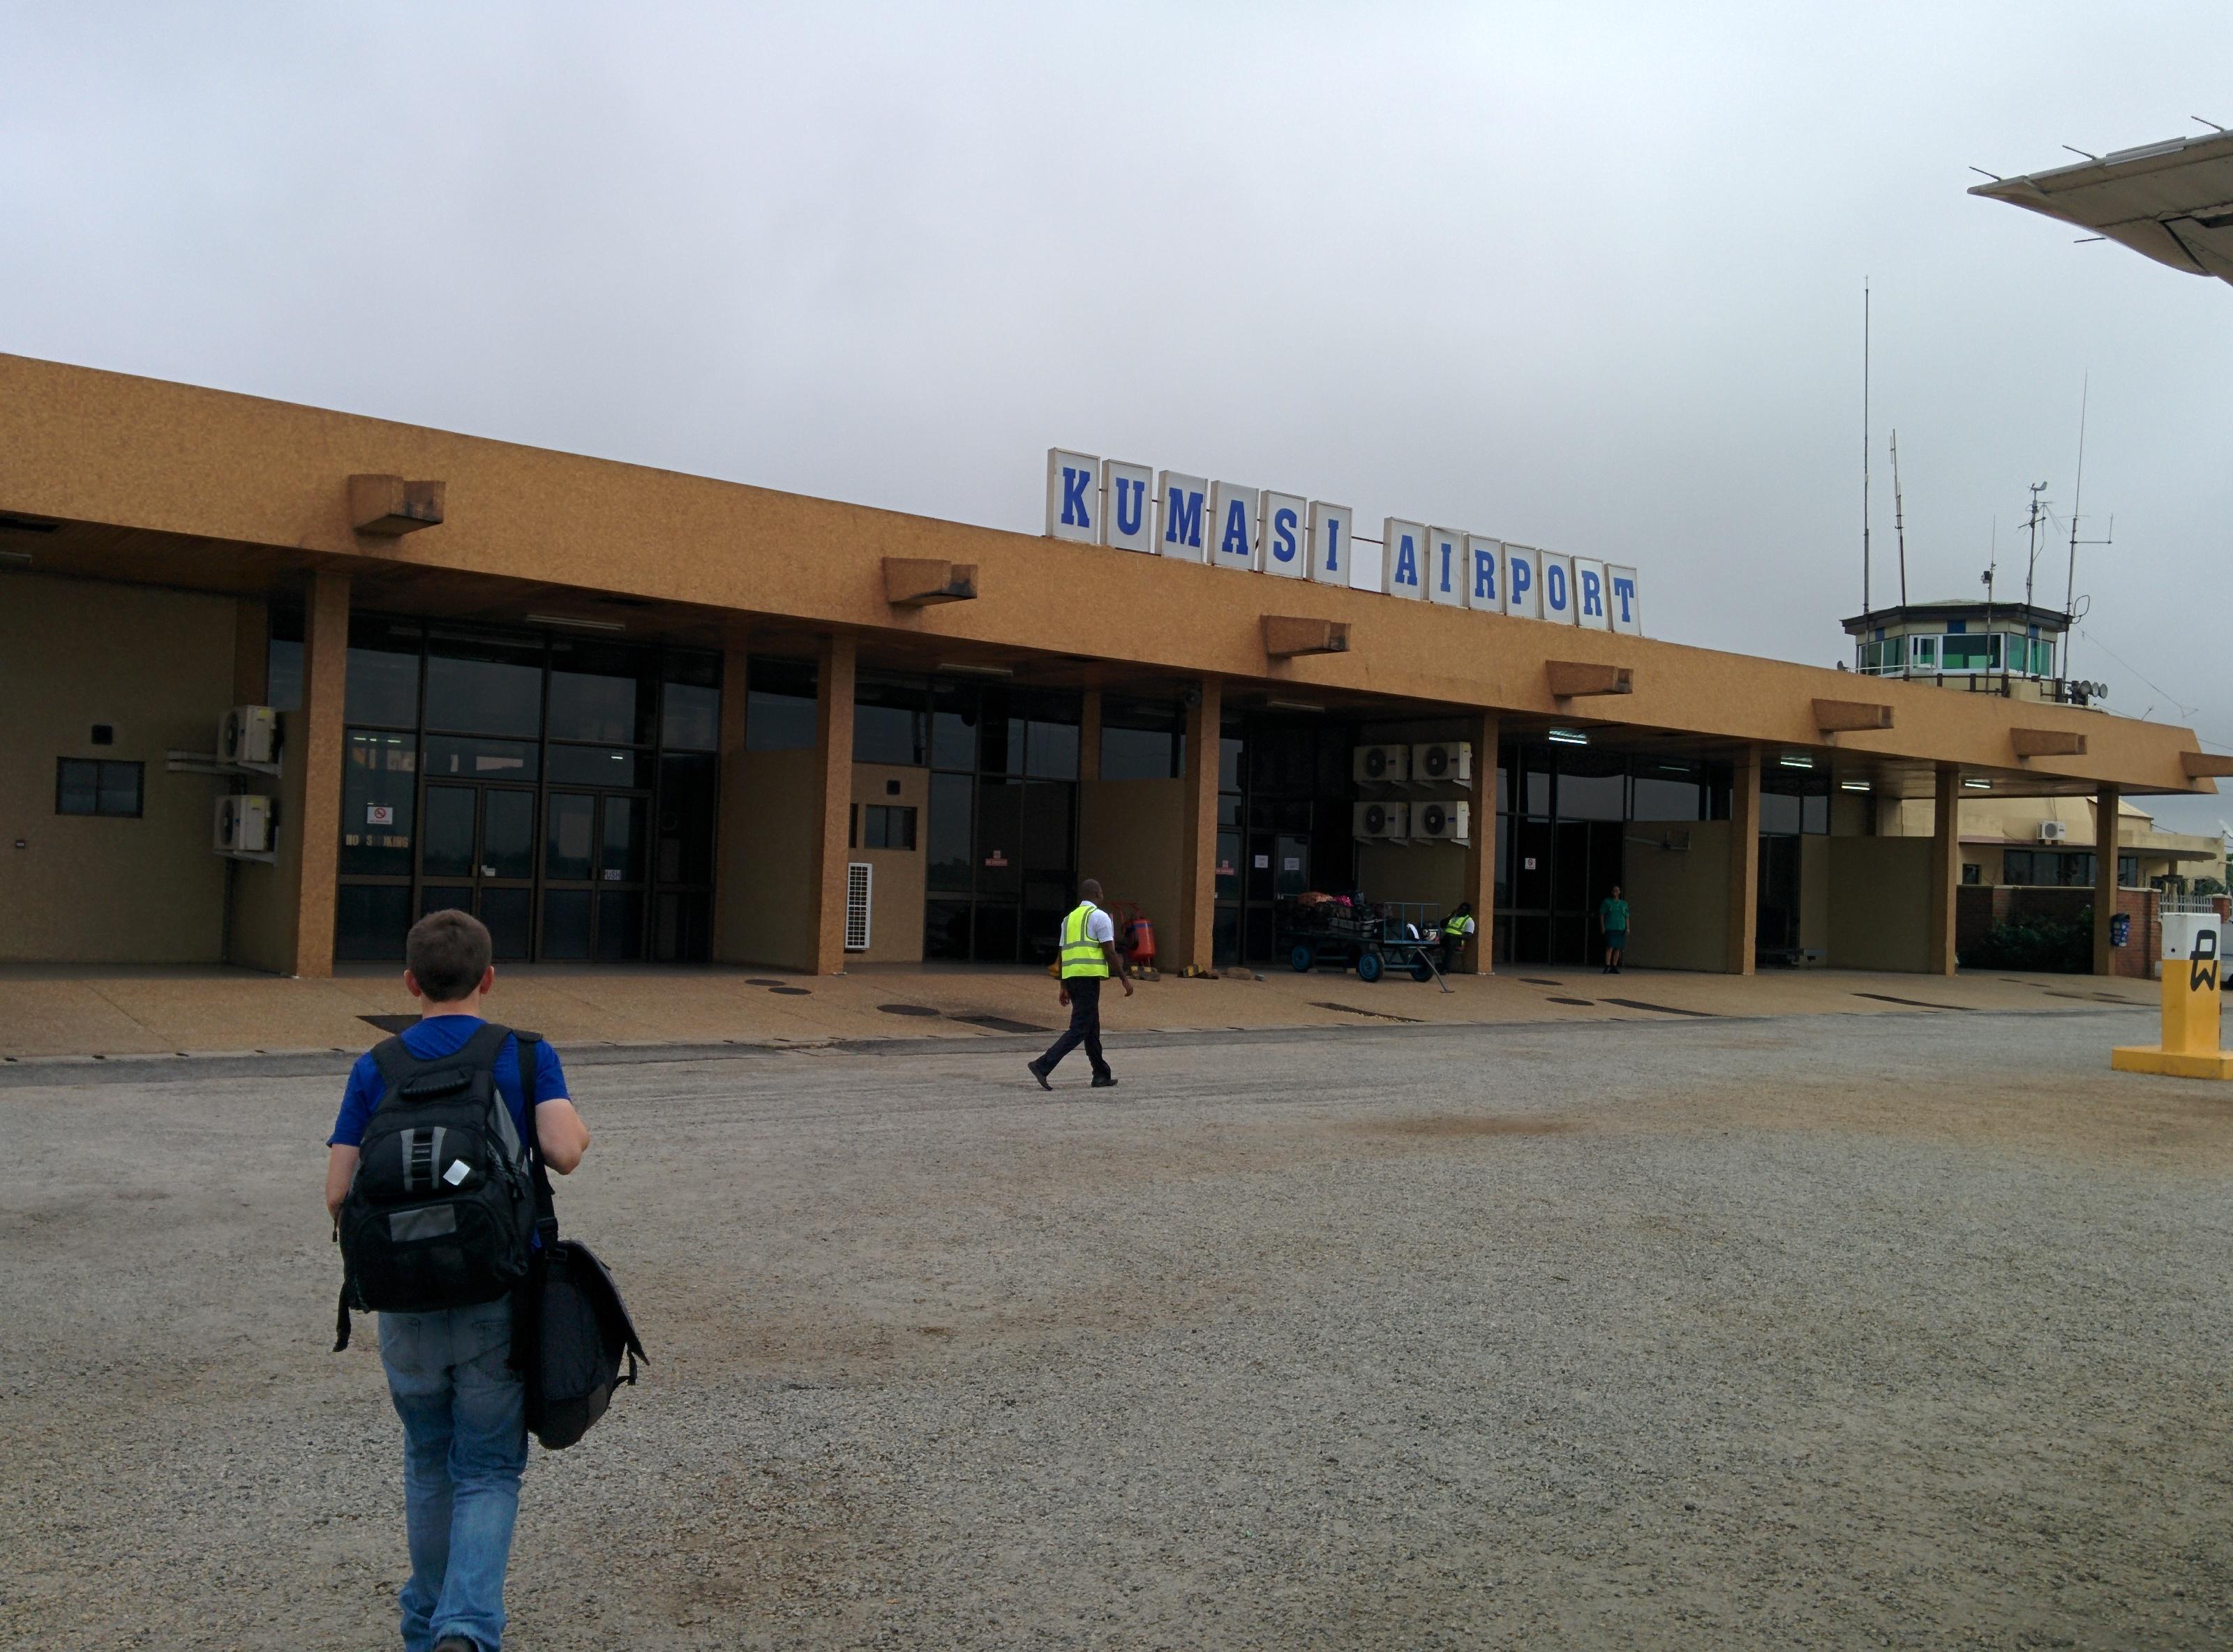 Kumasi, Ashanti and near Moon&Star